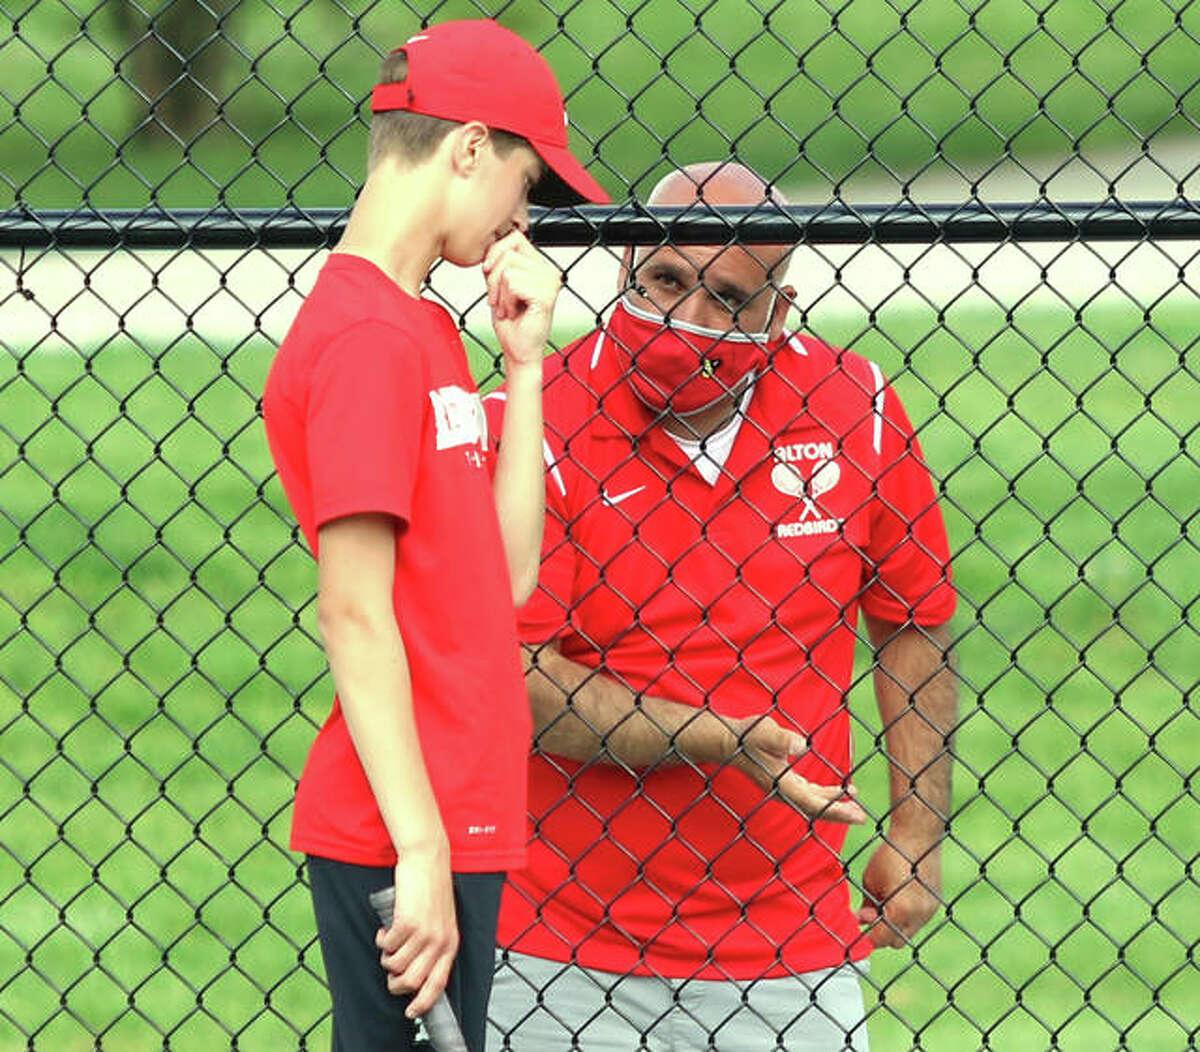 Alton High coach Jesse Macias (right) talks with freshman James McKeever last season.